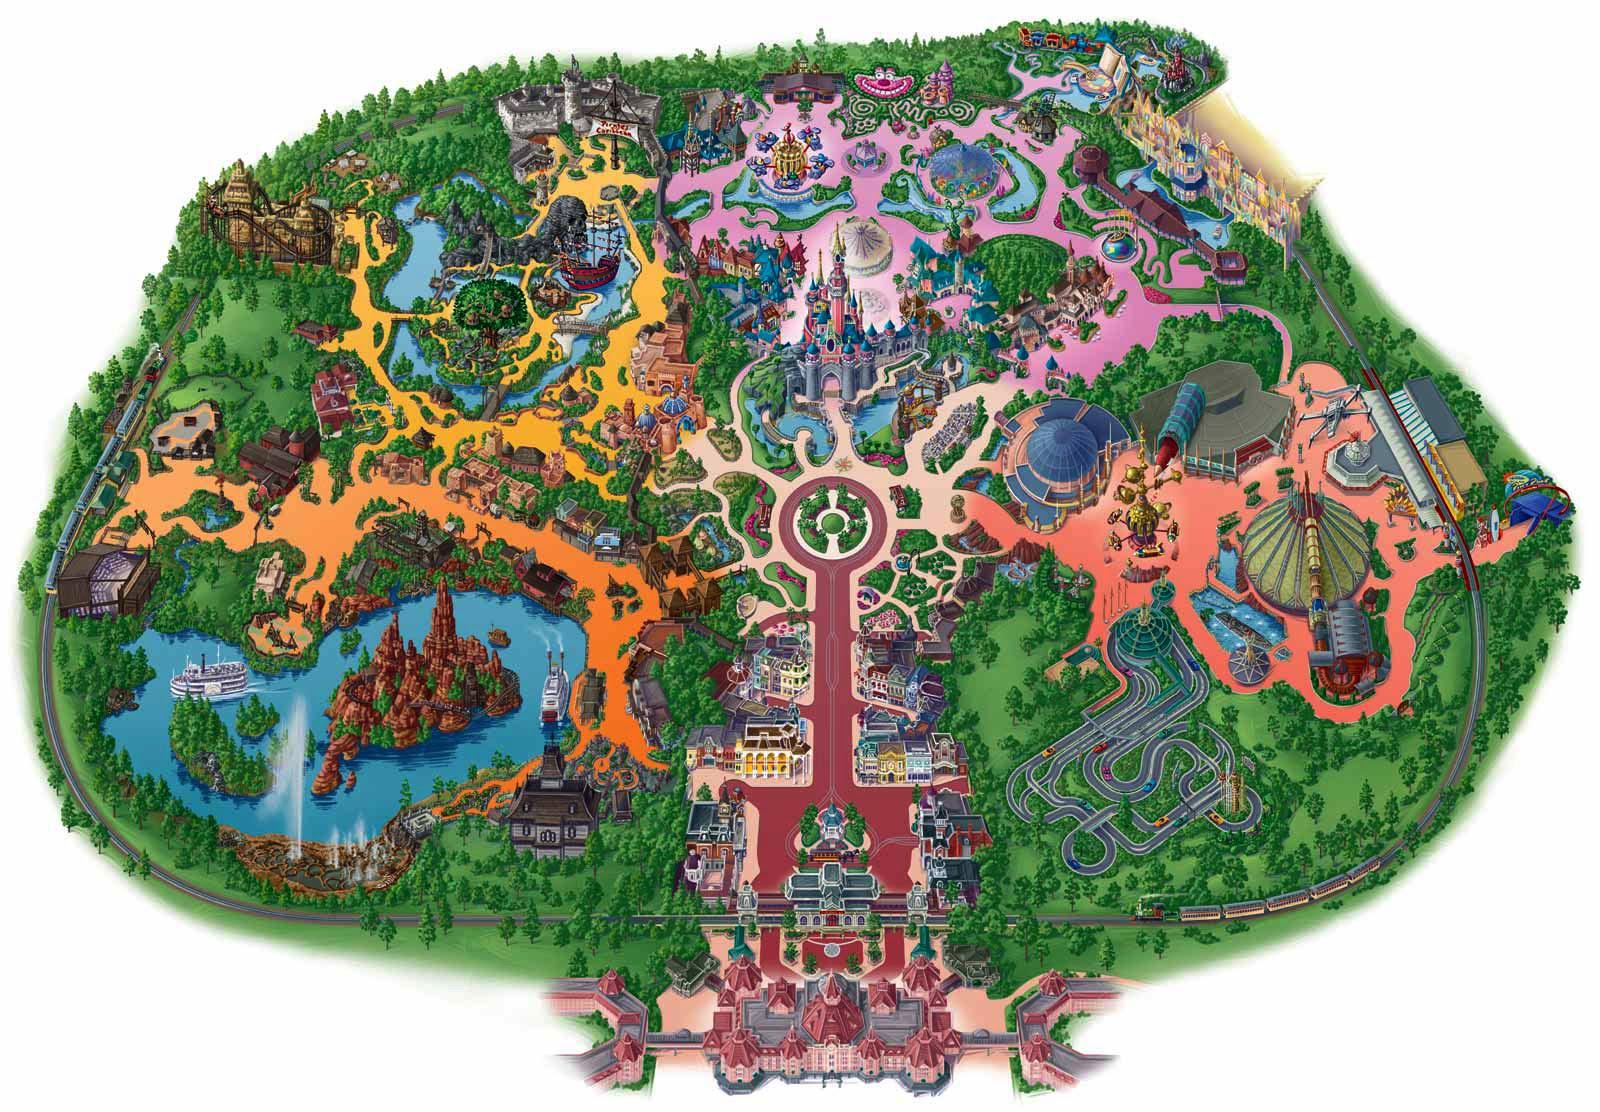 Disneyland in Paris | Map Collection